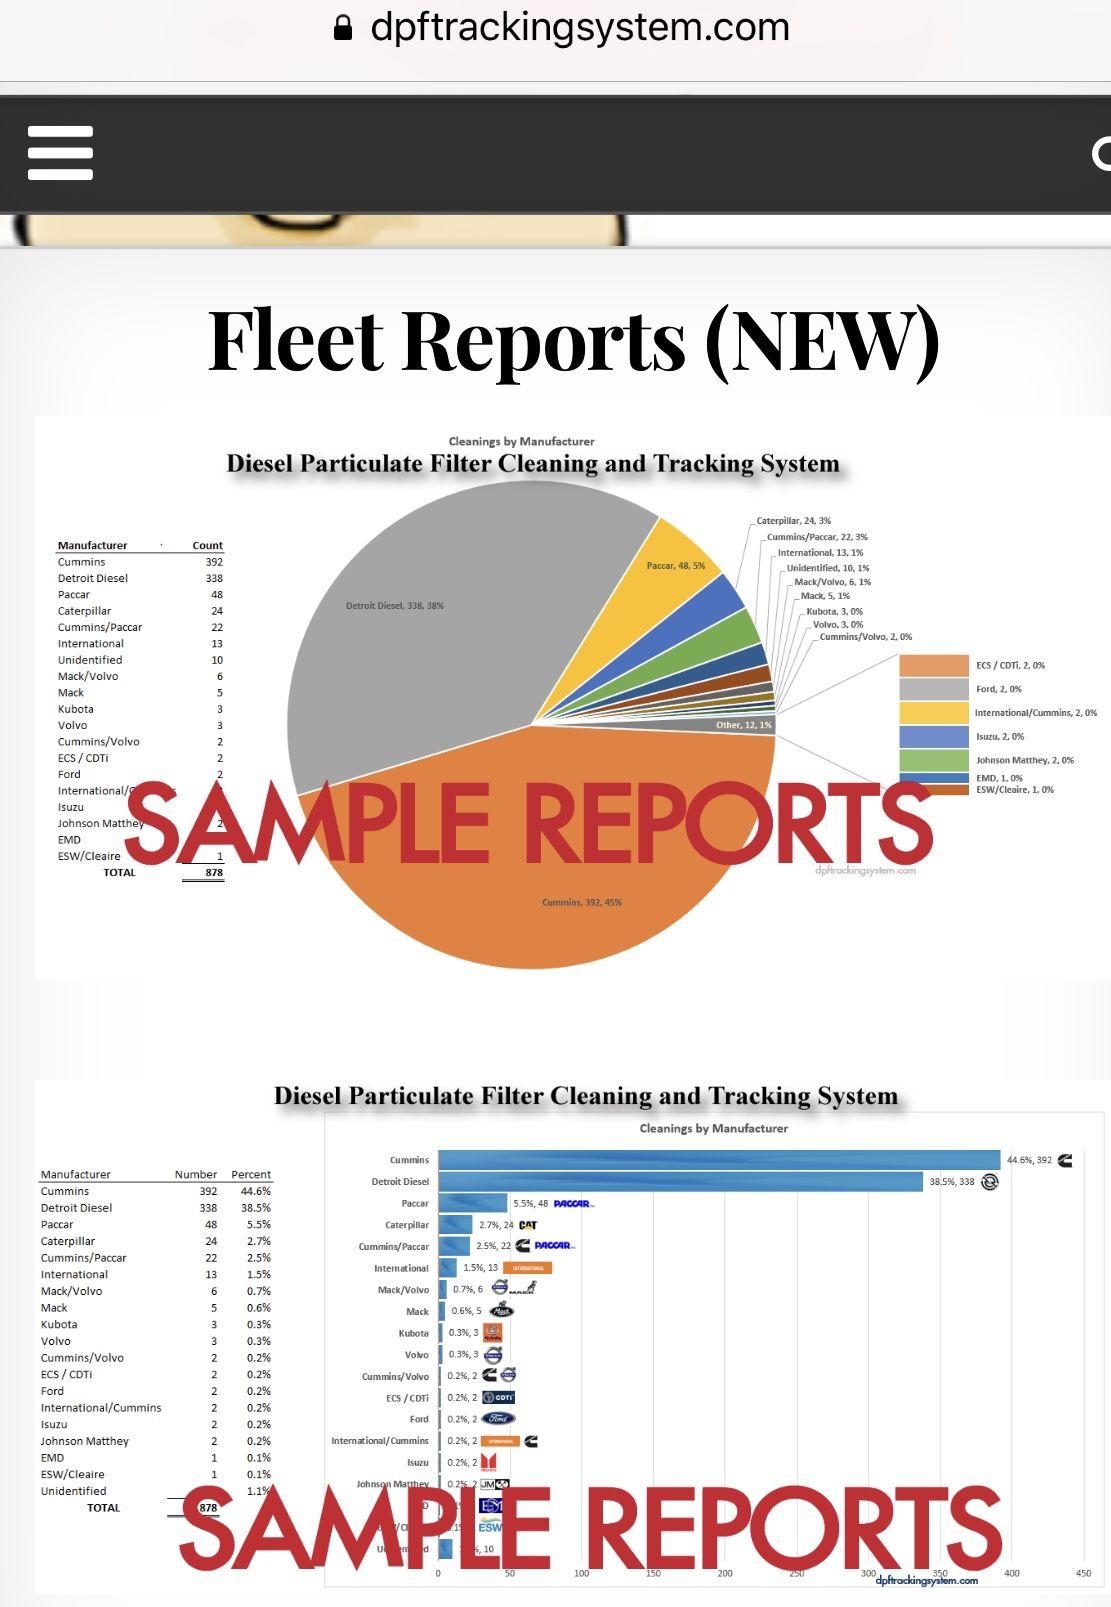 Fleet reports available through FSX TrapTrackerz. Apple